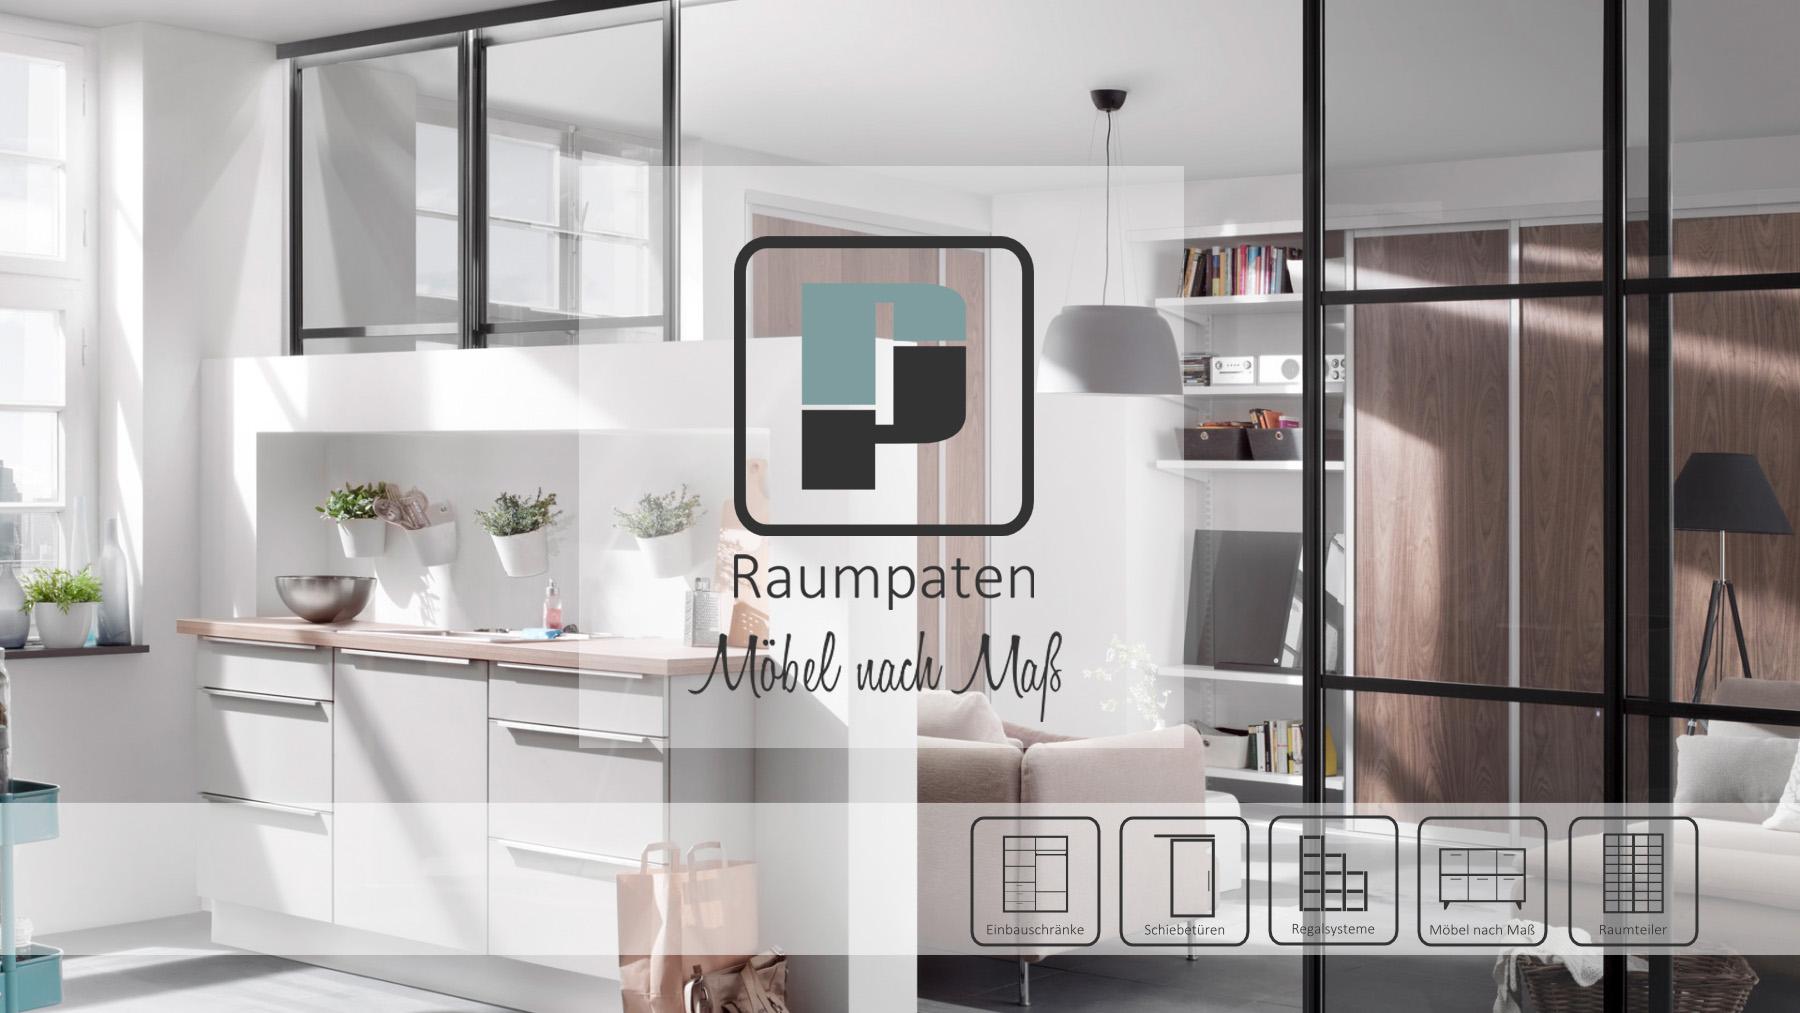 Raumpaten | Raumpaten Berlin